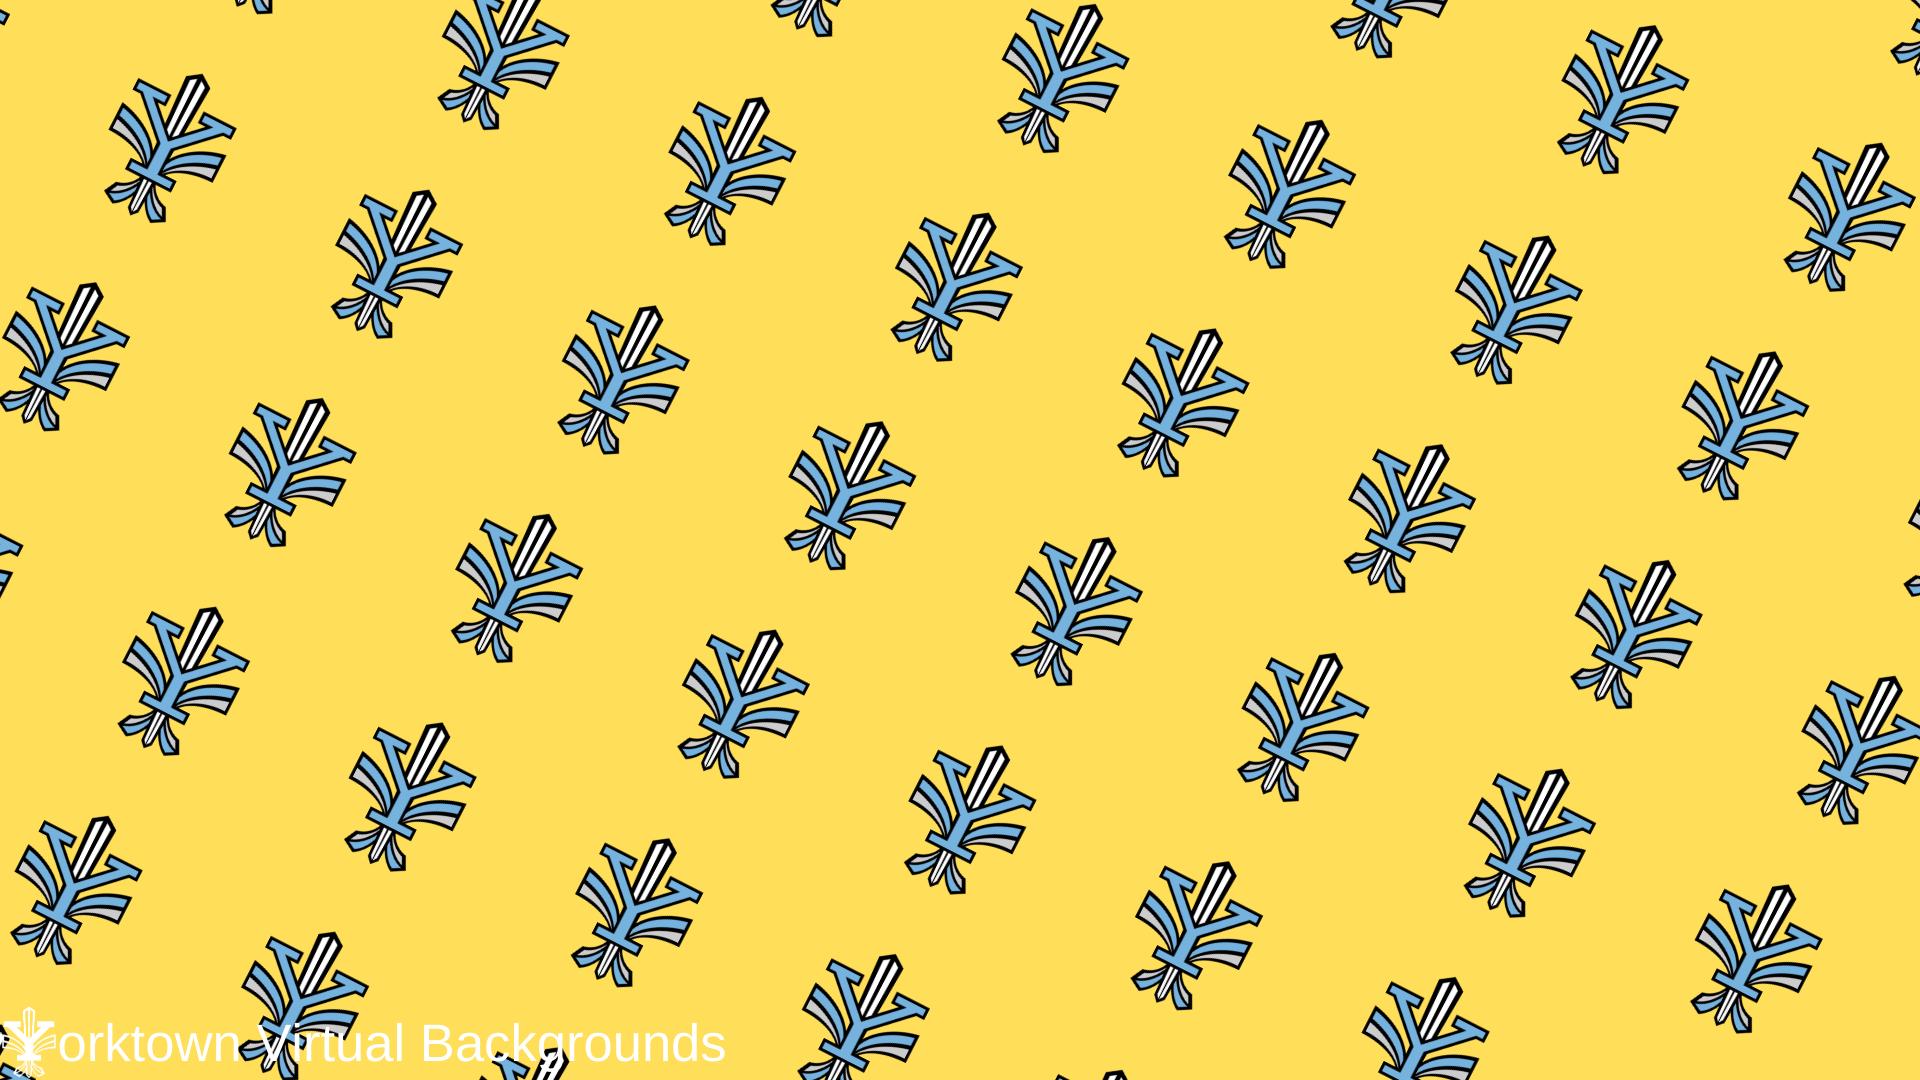 Yorktown Logo Wallpaper for Teams - Yellow - Diagonal